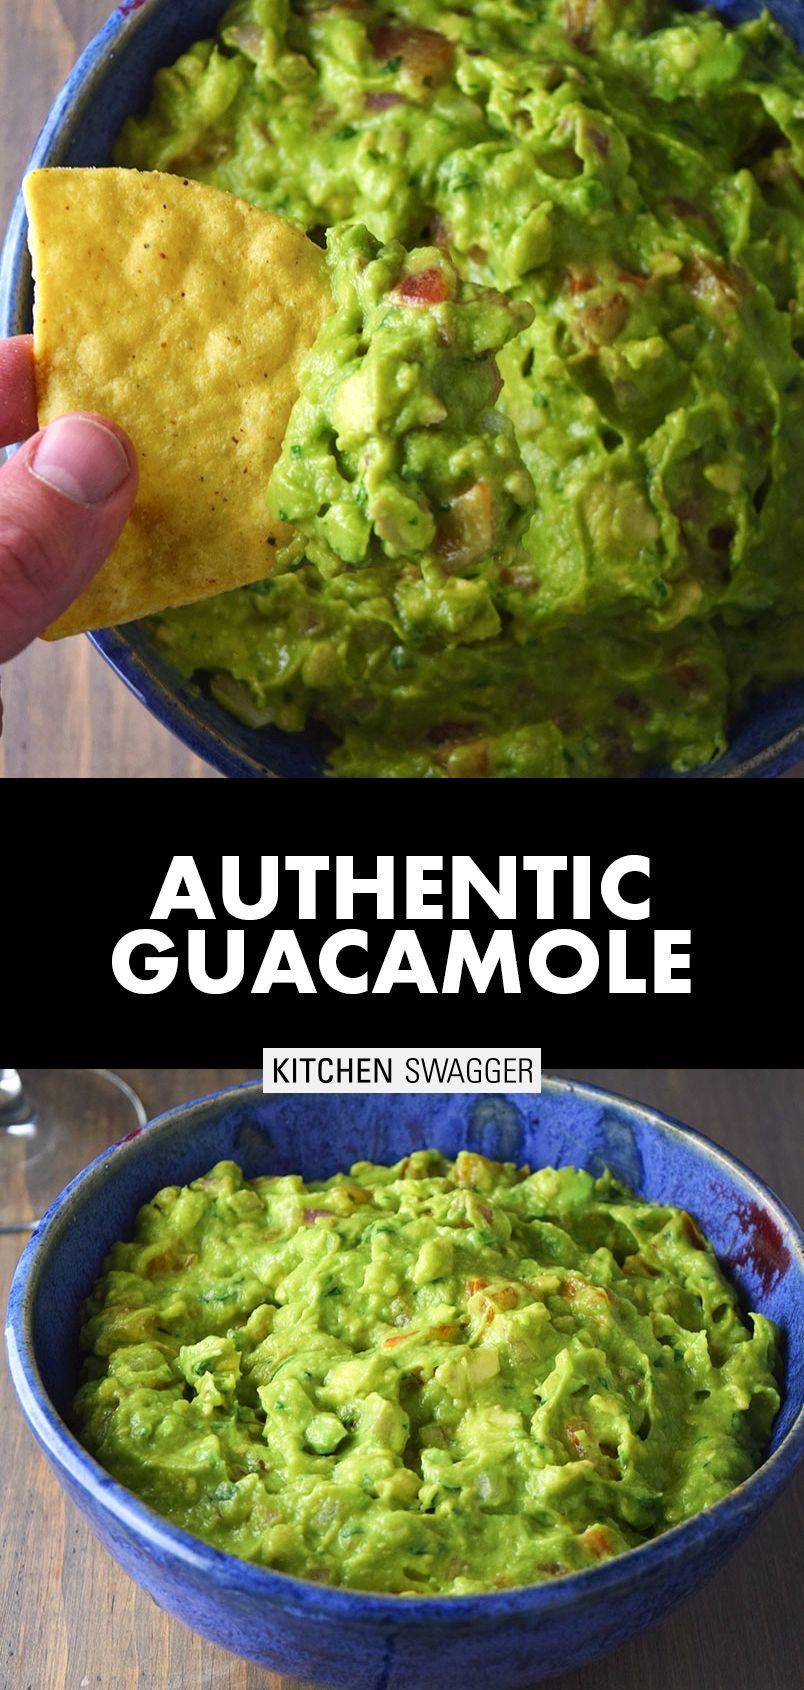 Authentic Guacamole Recipe Recipe Best Guacamole Recipe Guacamole Recipe Authentic Guacamole Recipe